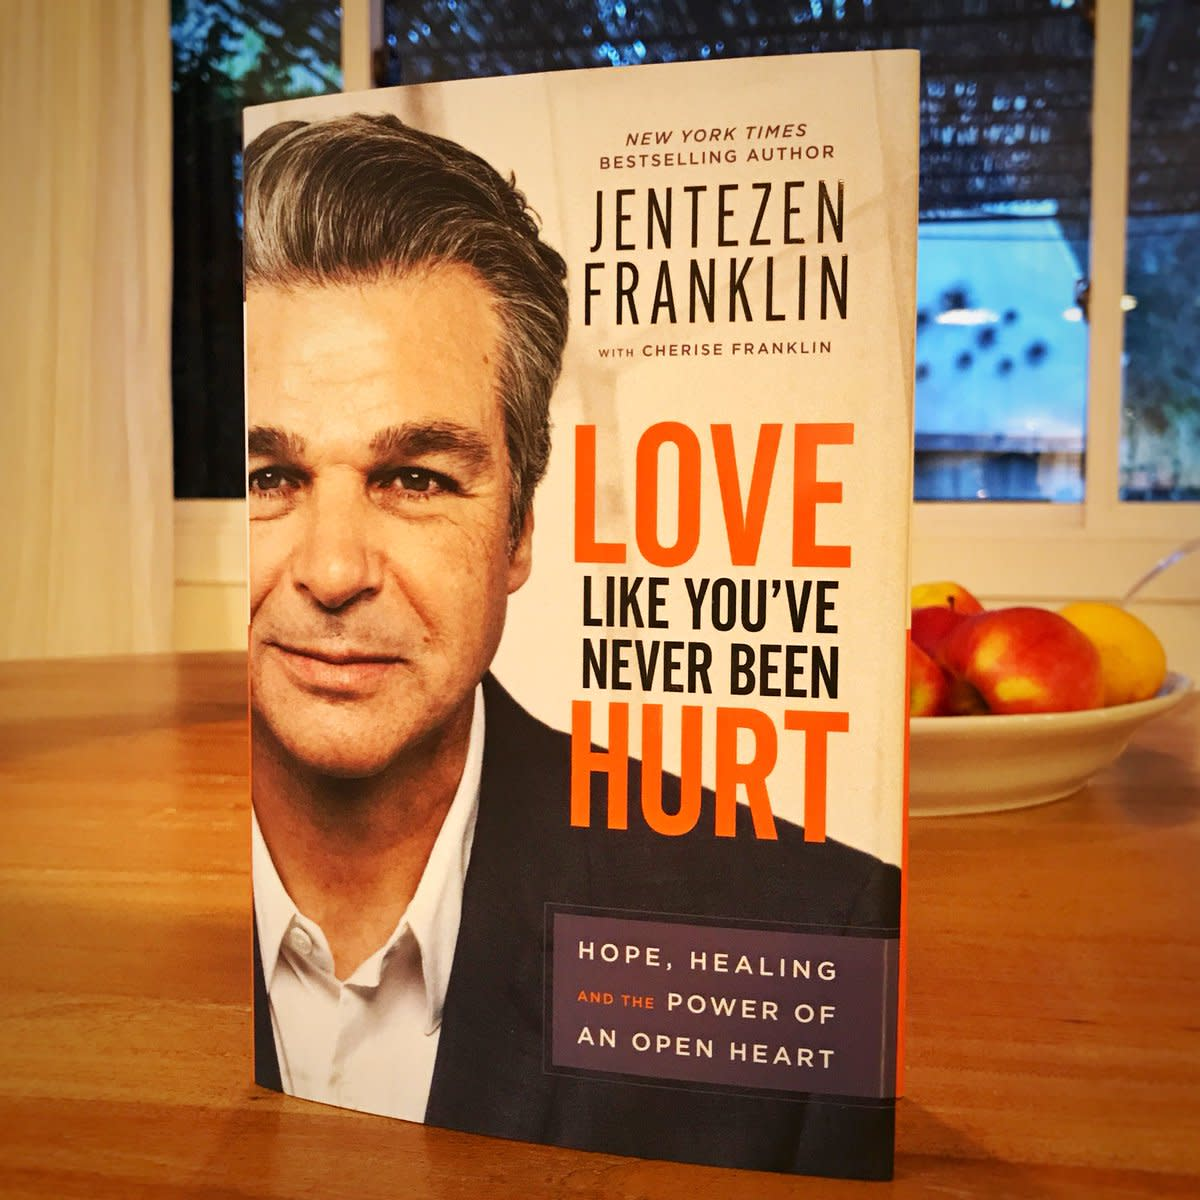 'Love Like You've Never Been Hurt' Book by Jentezen Franklin